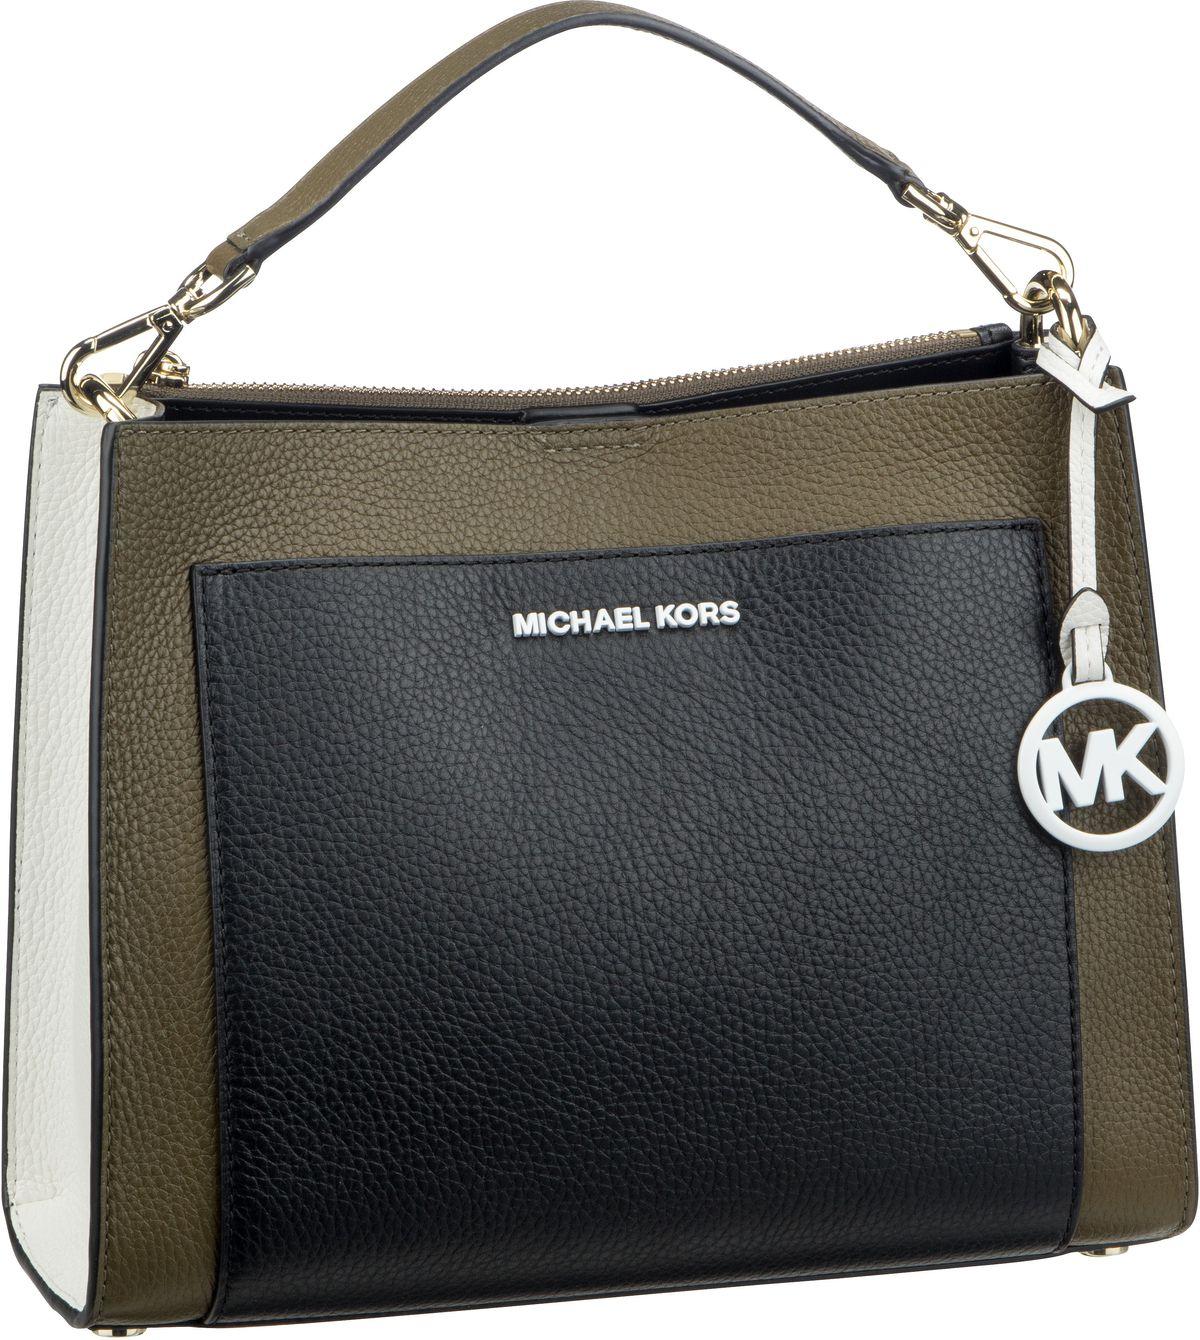 Michael Kors Handtasche Gemma Medium Pocket TH Satchel Olive Multi